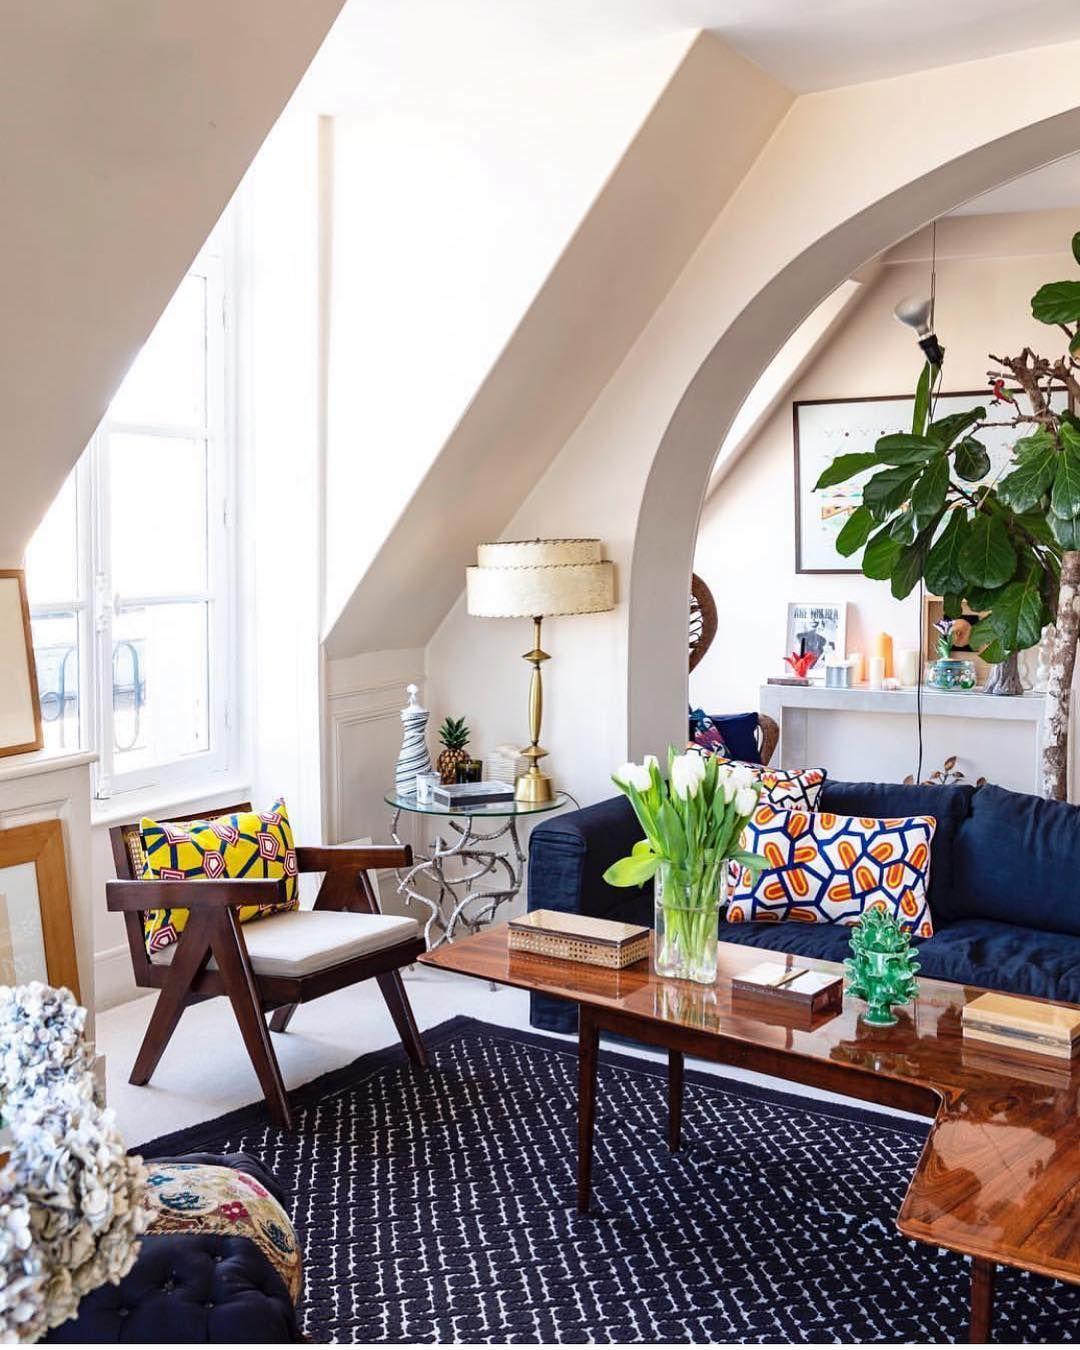 New The 10 Best Home Decor With Pictures Interiordesign Design Interior Homedecor Architecture Ar Home Decor Interior Design Decor Interior Design